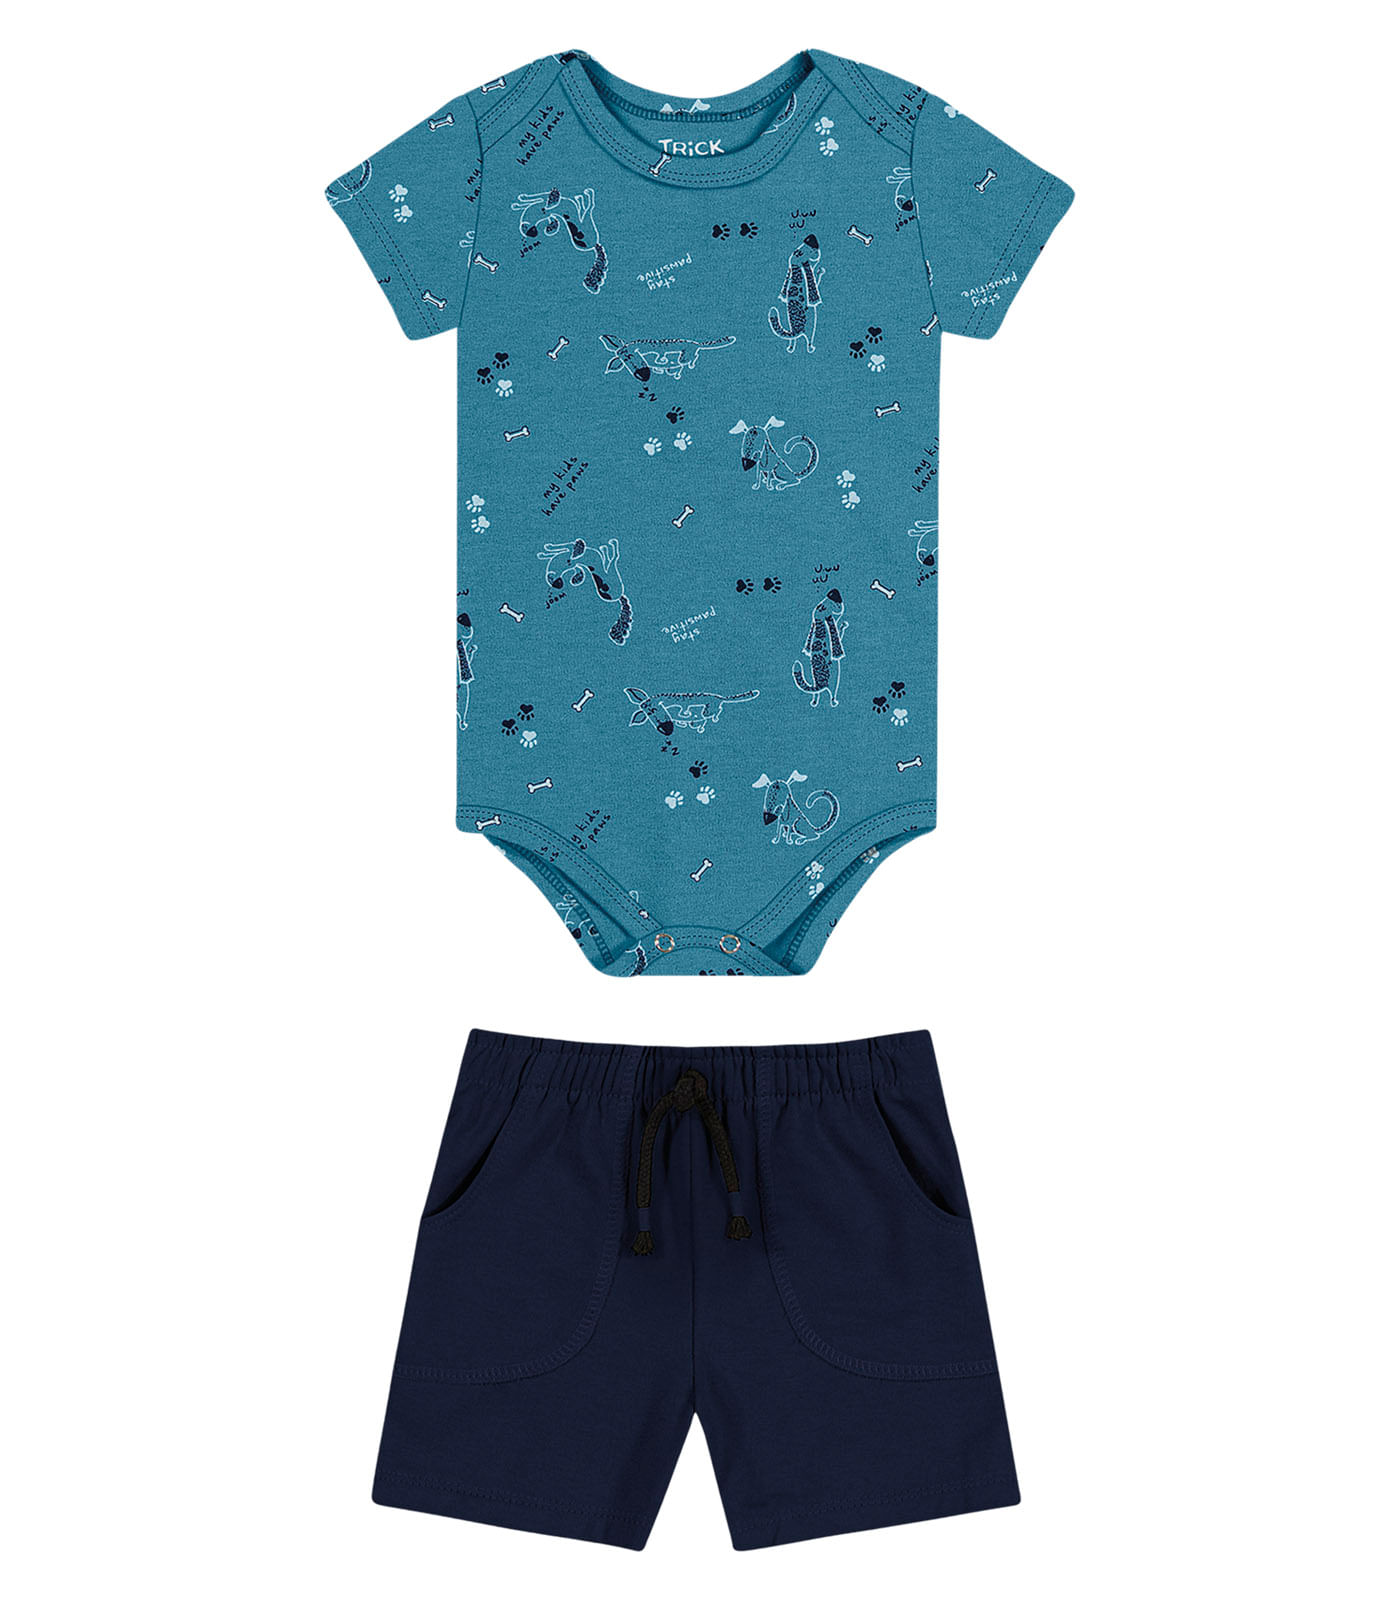 Conjunto masculino Body com Shorts Trick Nick Azul